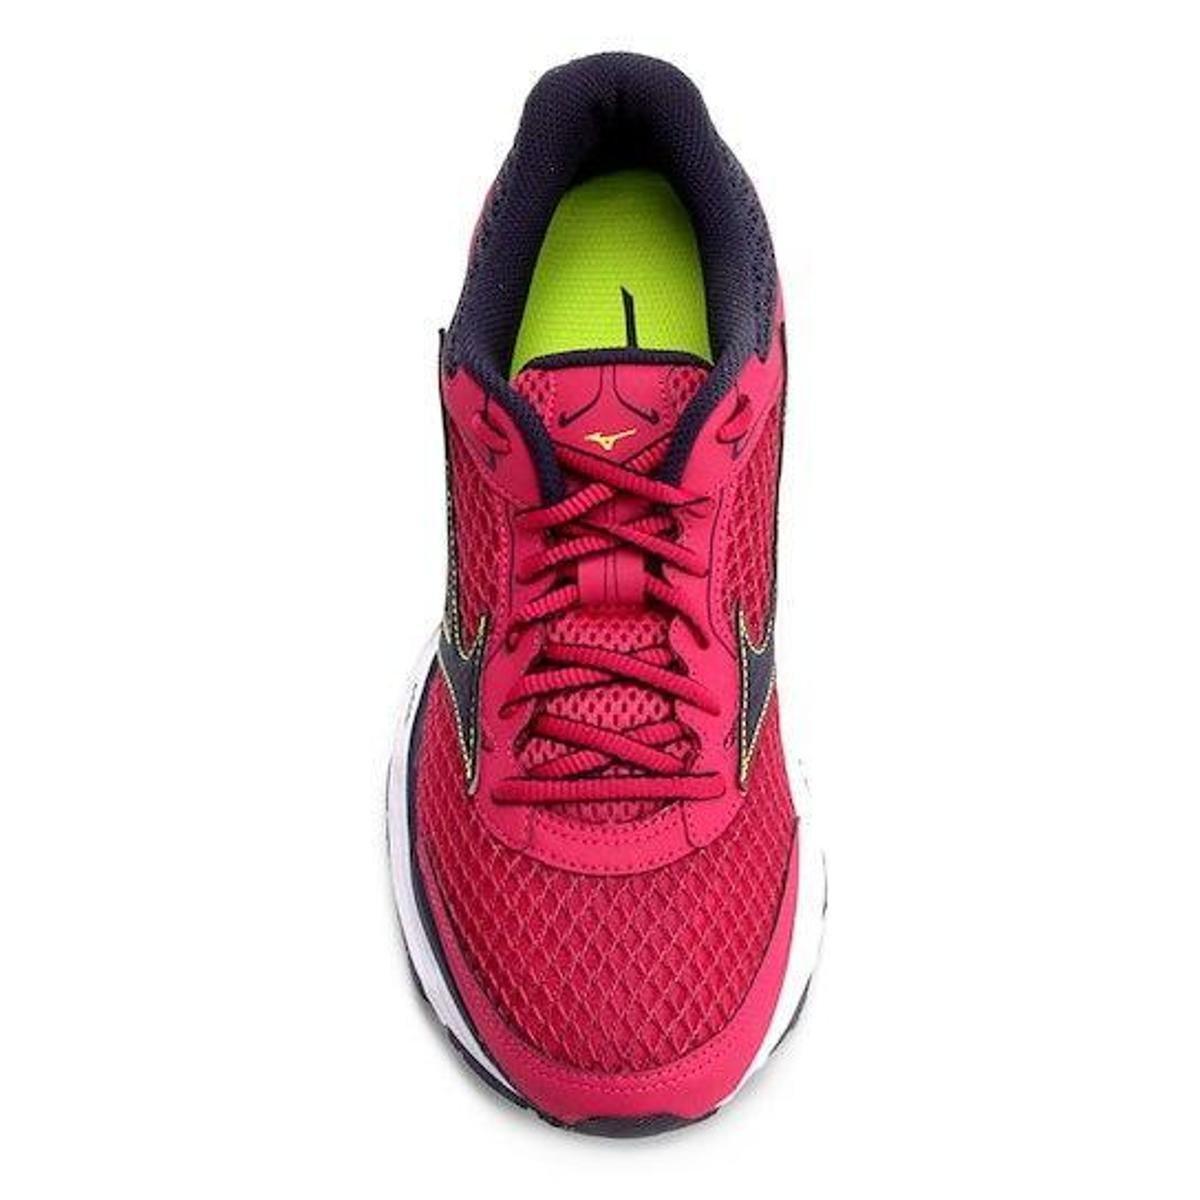 Tênis Mizuno Wave Frontier 11 Feminino - Rosa - Compre Agora Netshoes  a54bae03f149bb ... b0378f6381fc0